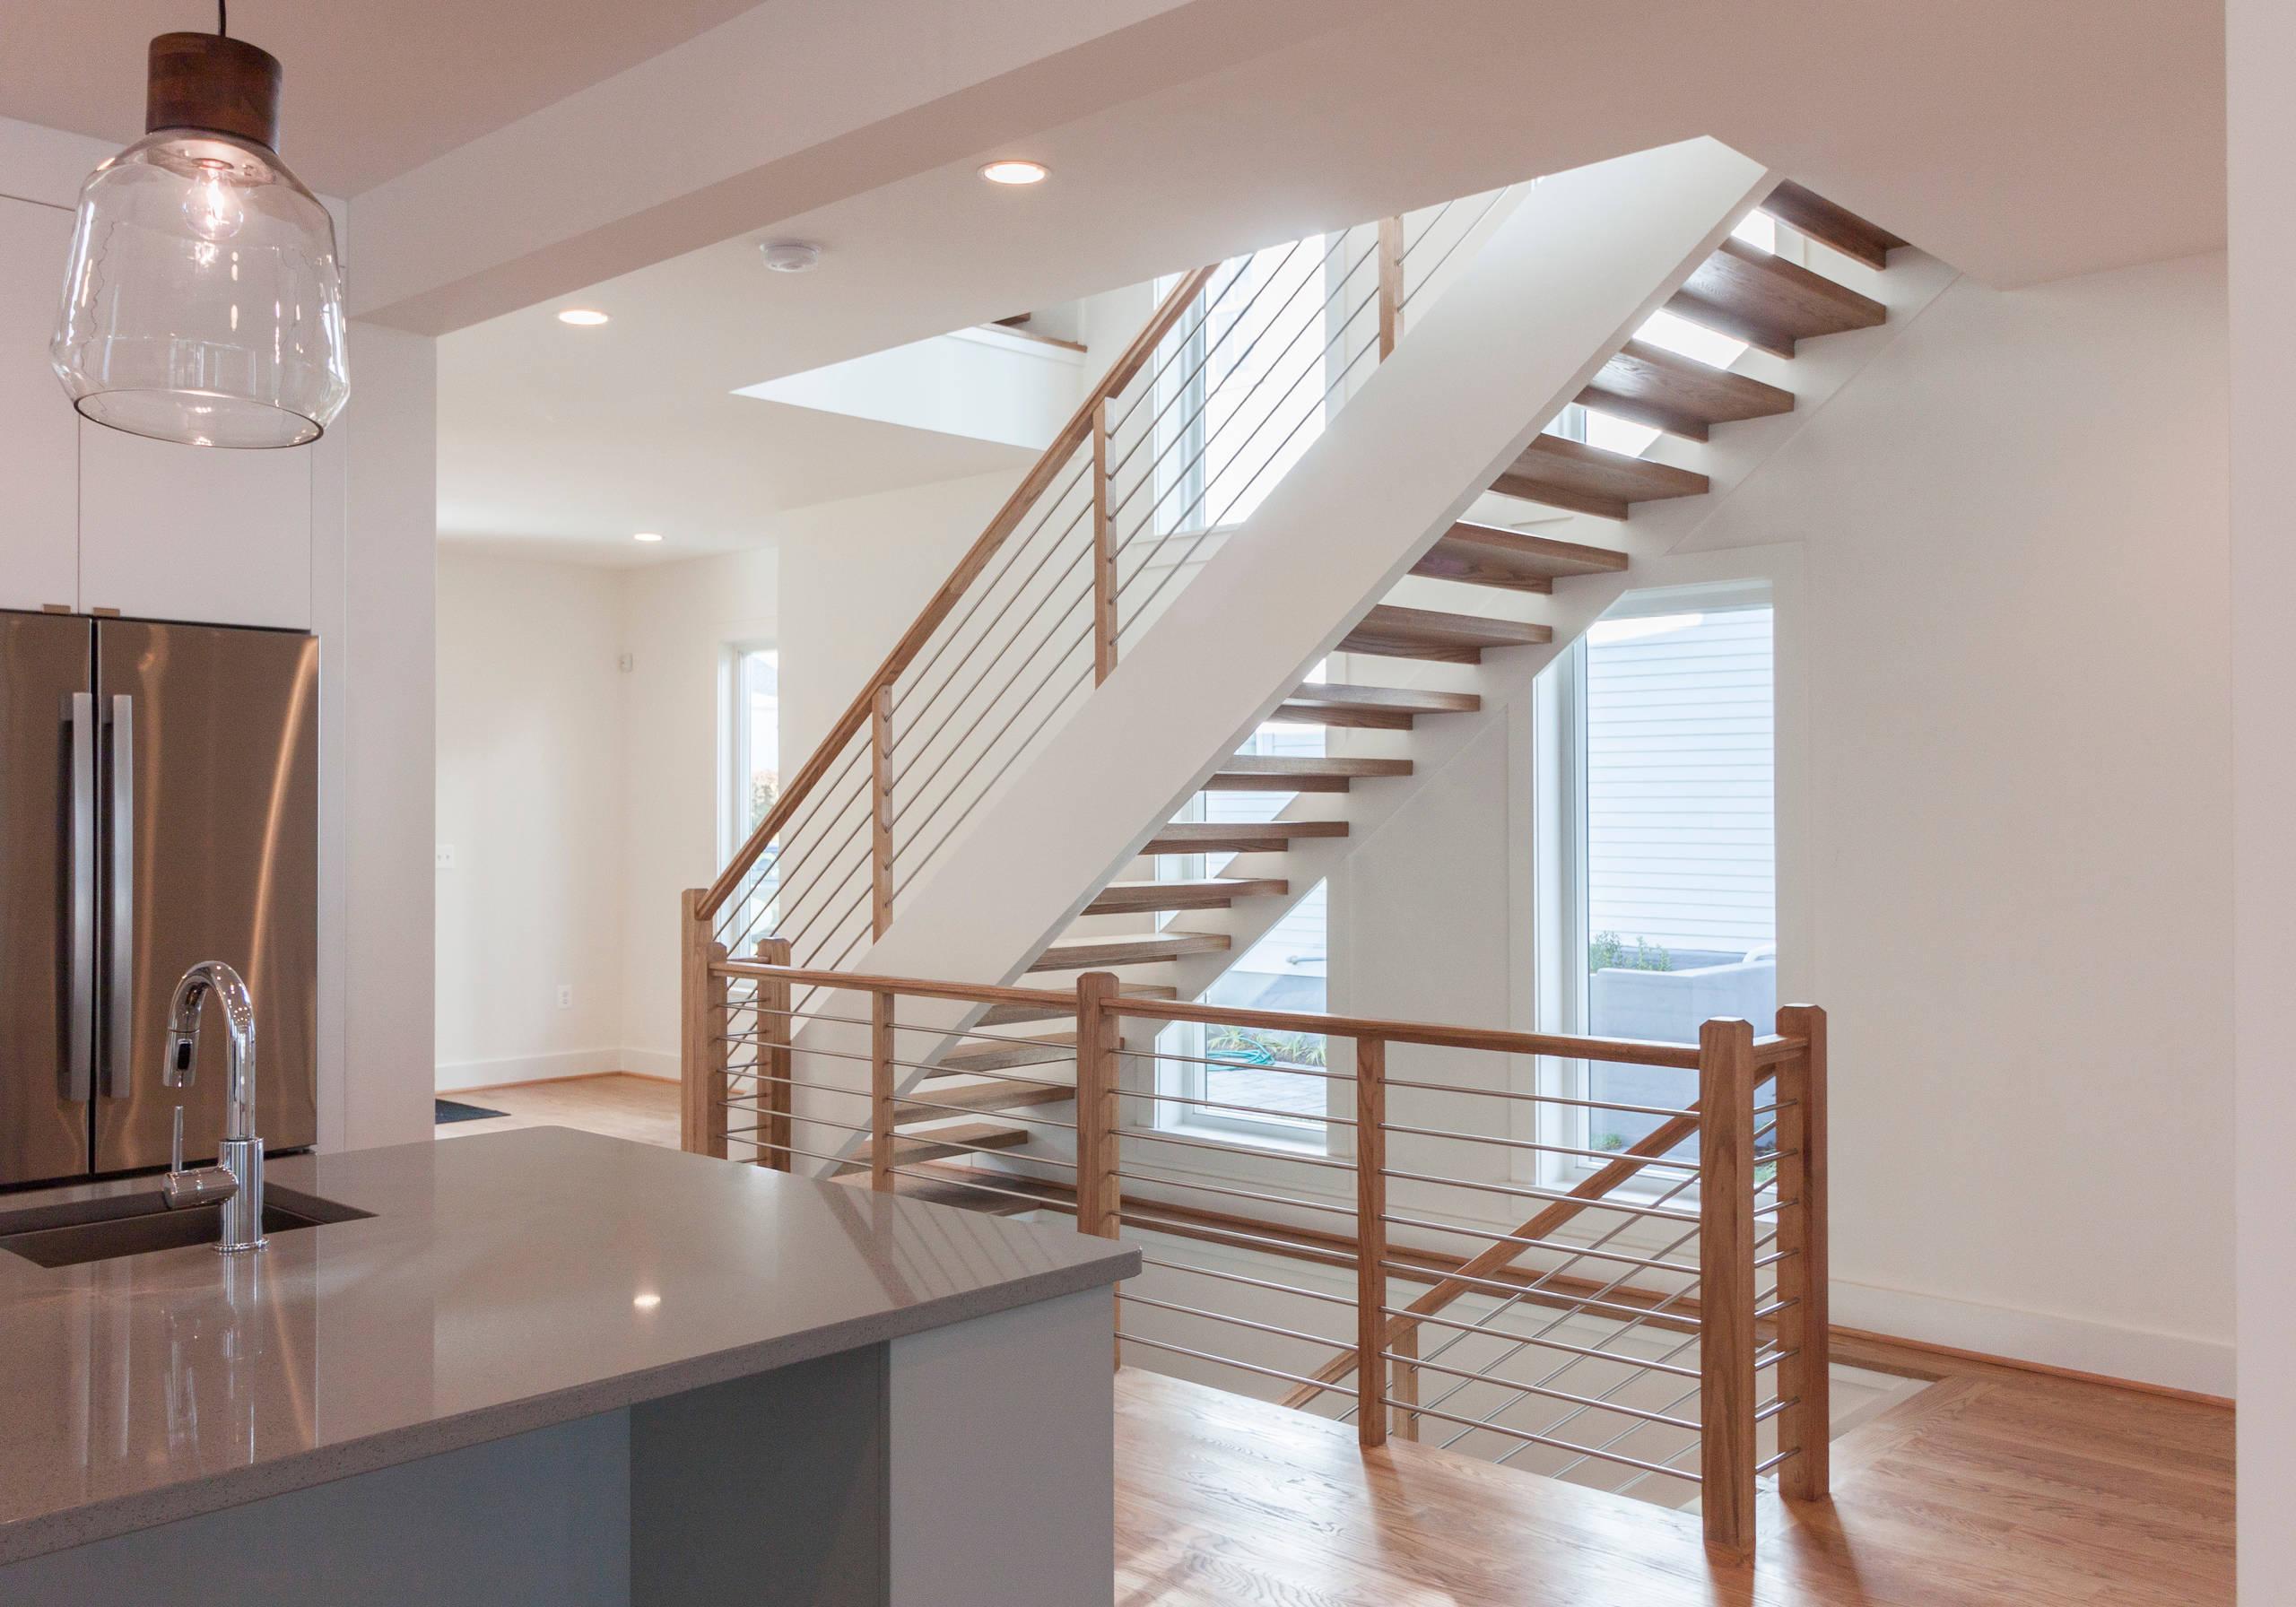 48_Contemporary Round Stainless Steel Balustrade & Oak Treads, Arlington VA 2220